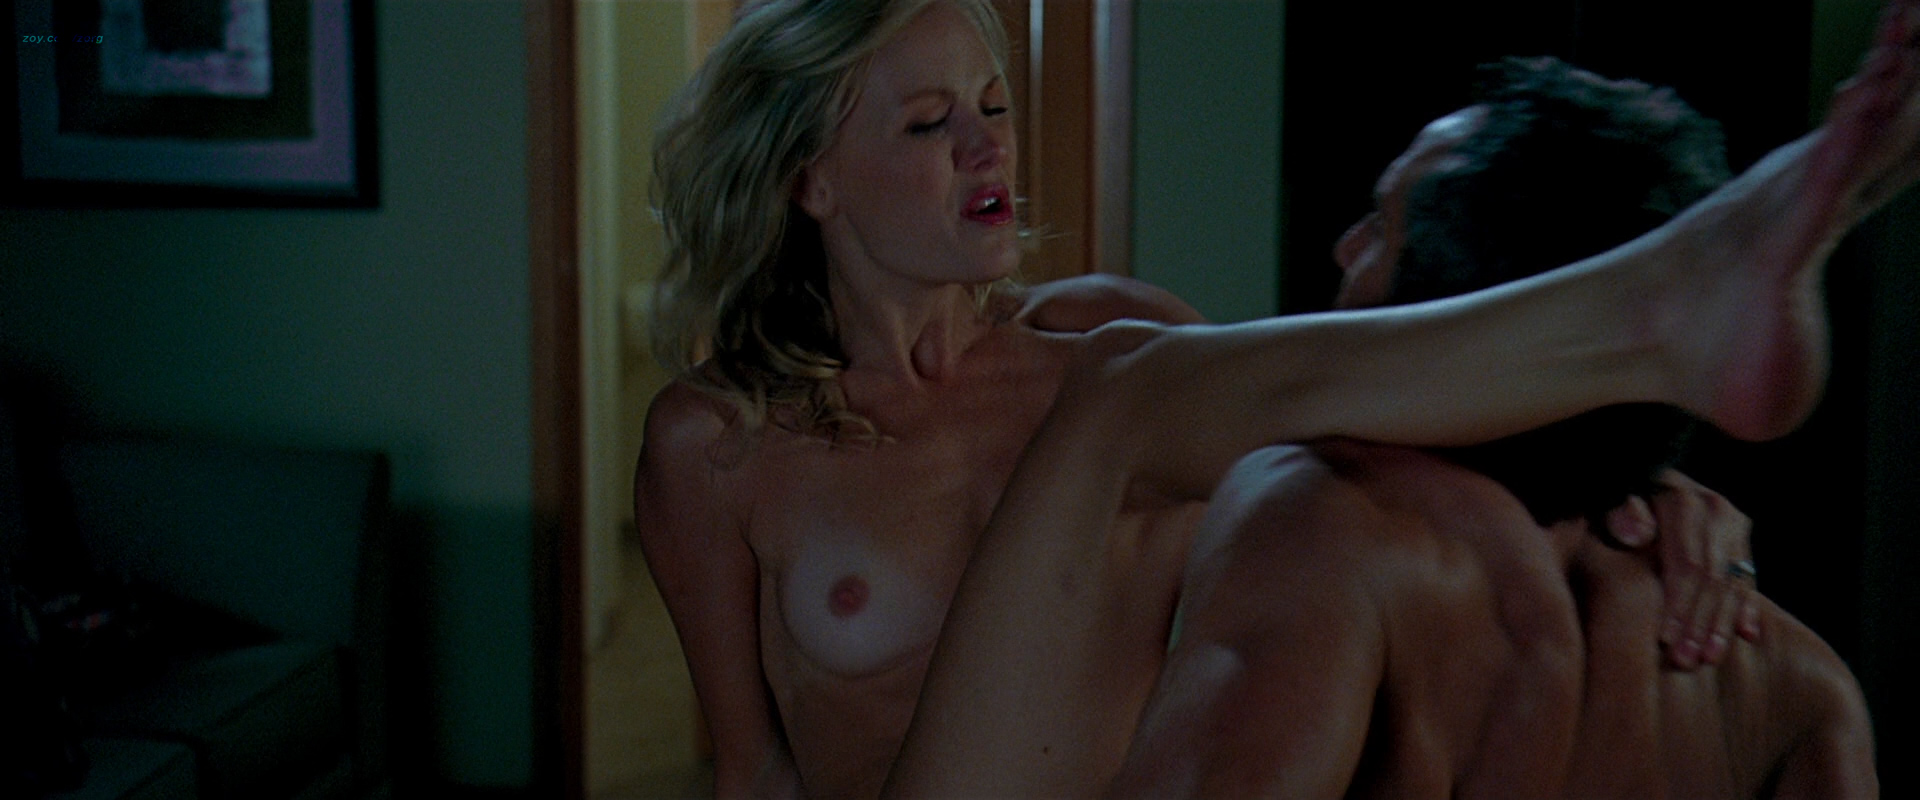 Malin Akerman Nude And Wild Sex And Kayla Kleevage Nude -9838